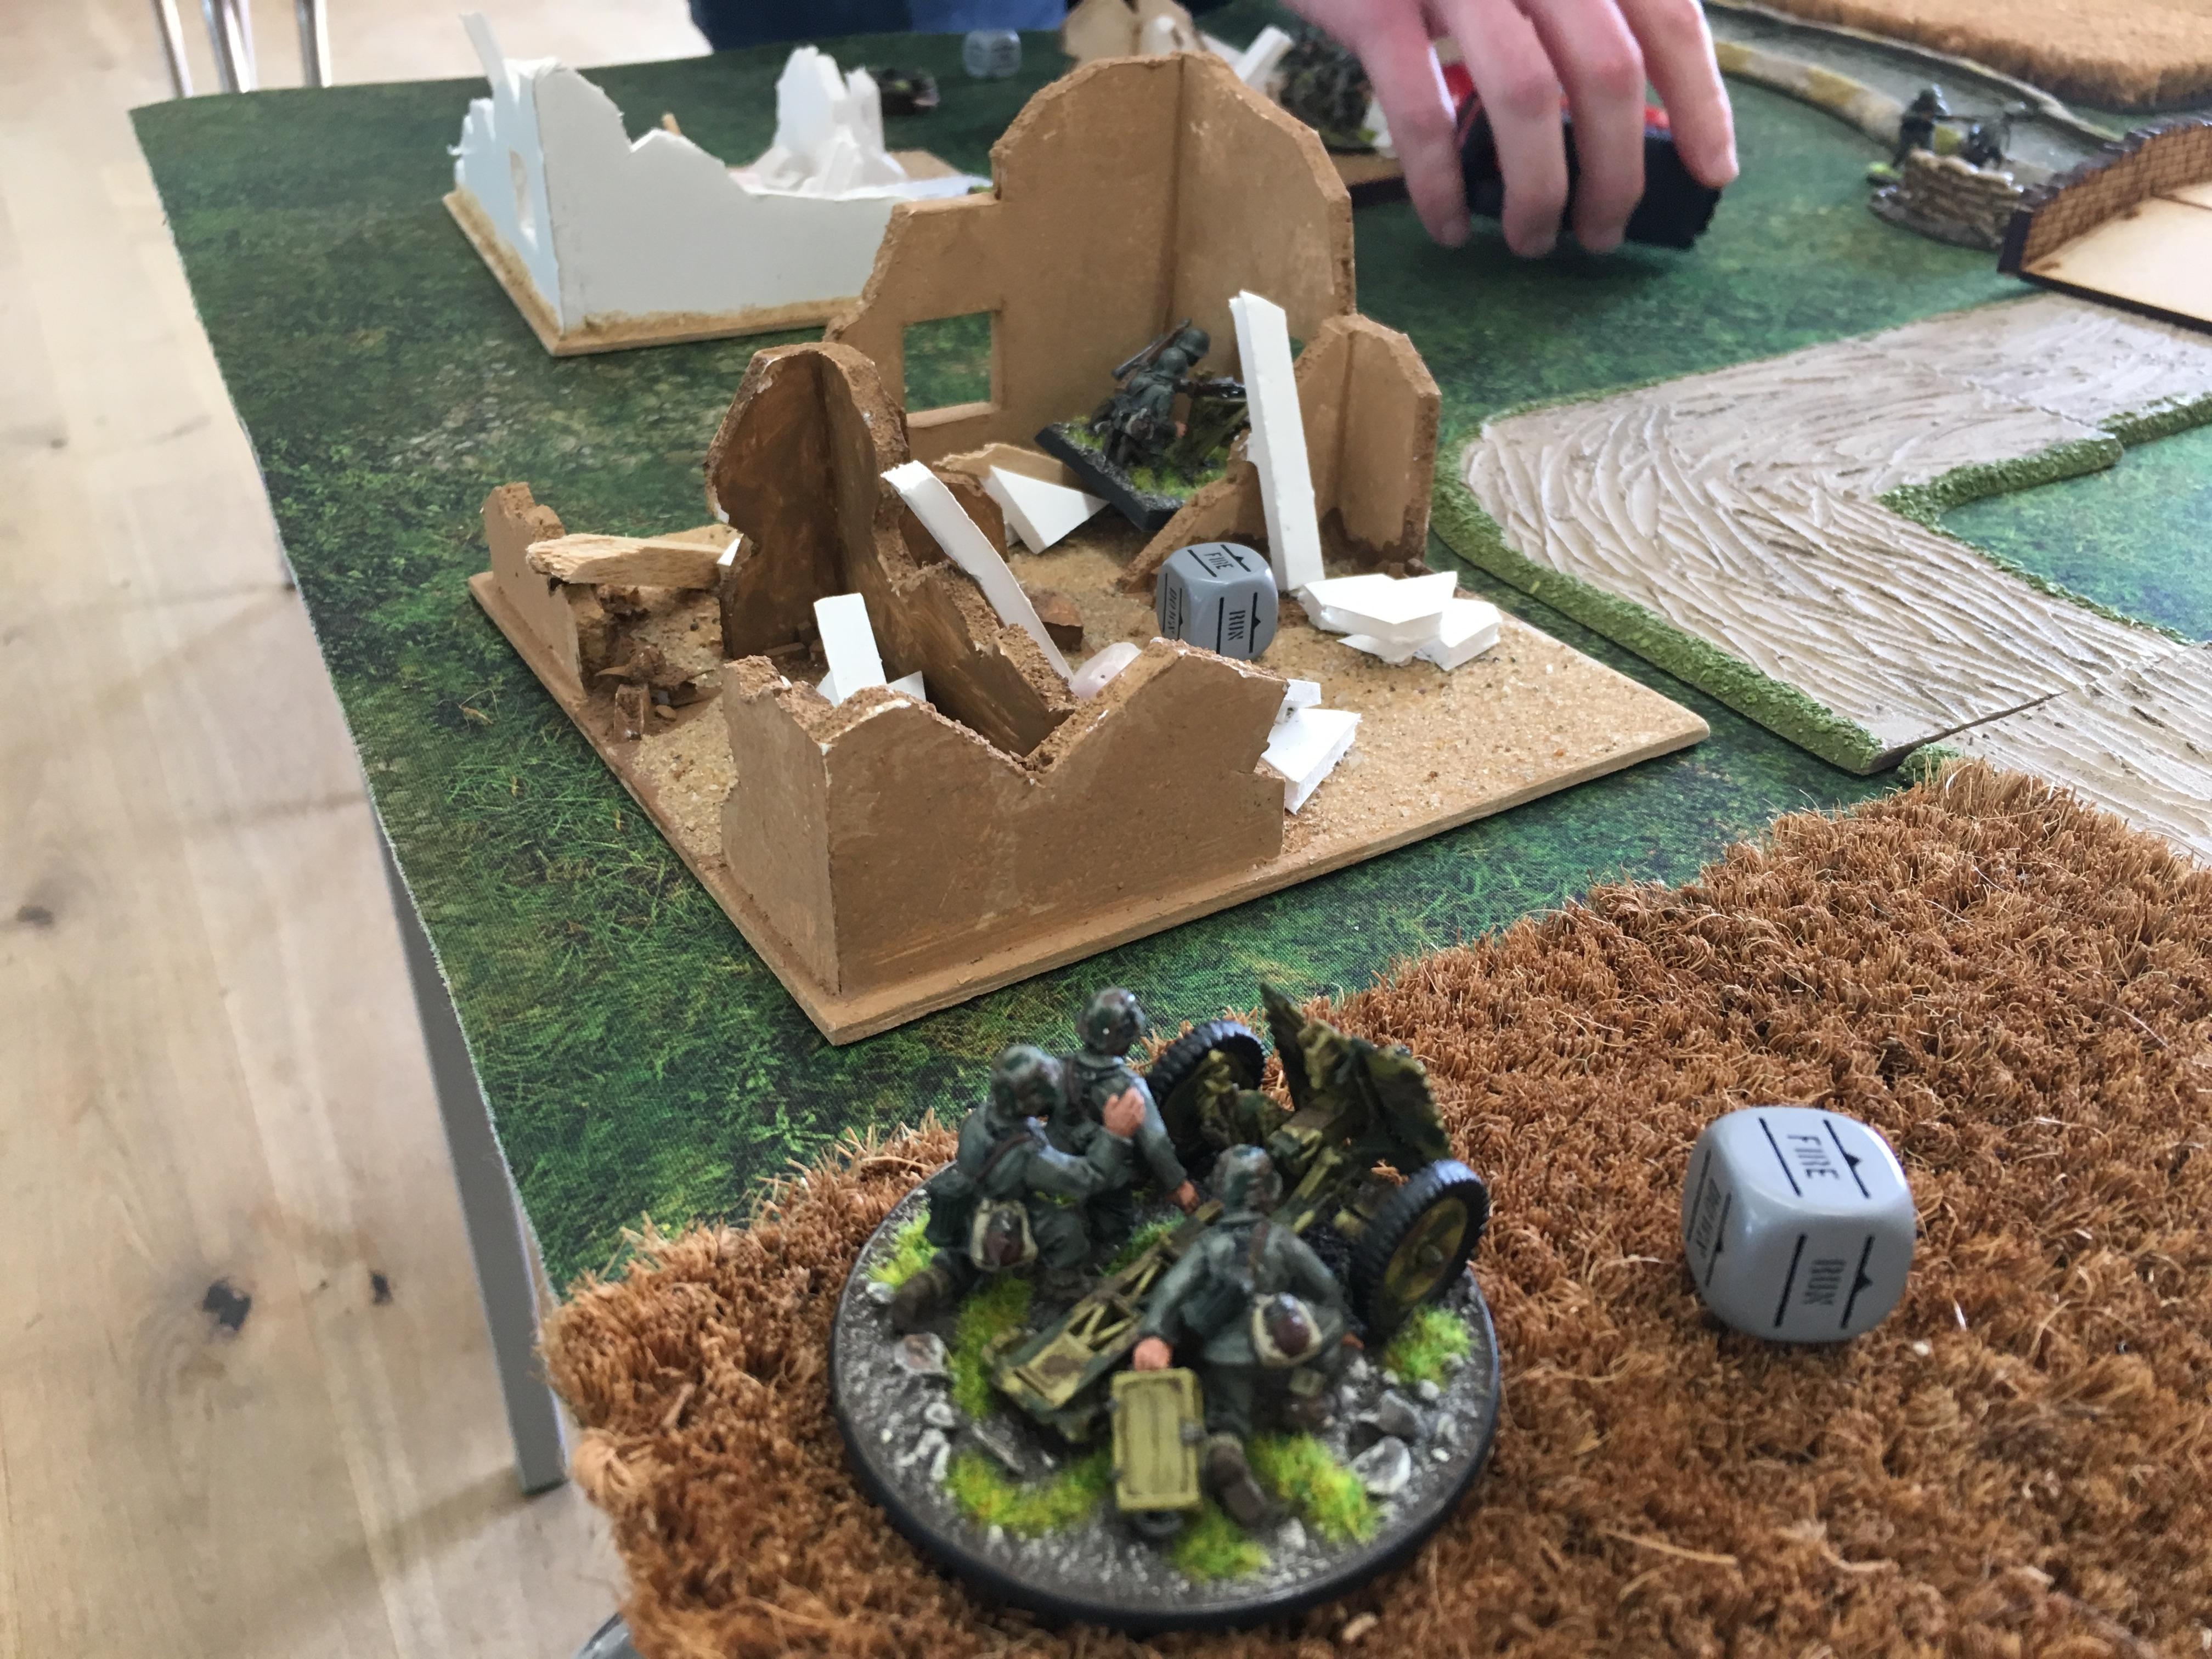 German grenadier's versus 1st USMC Division in a fierce infantry engagement